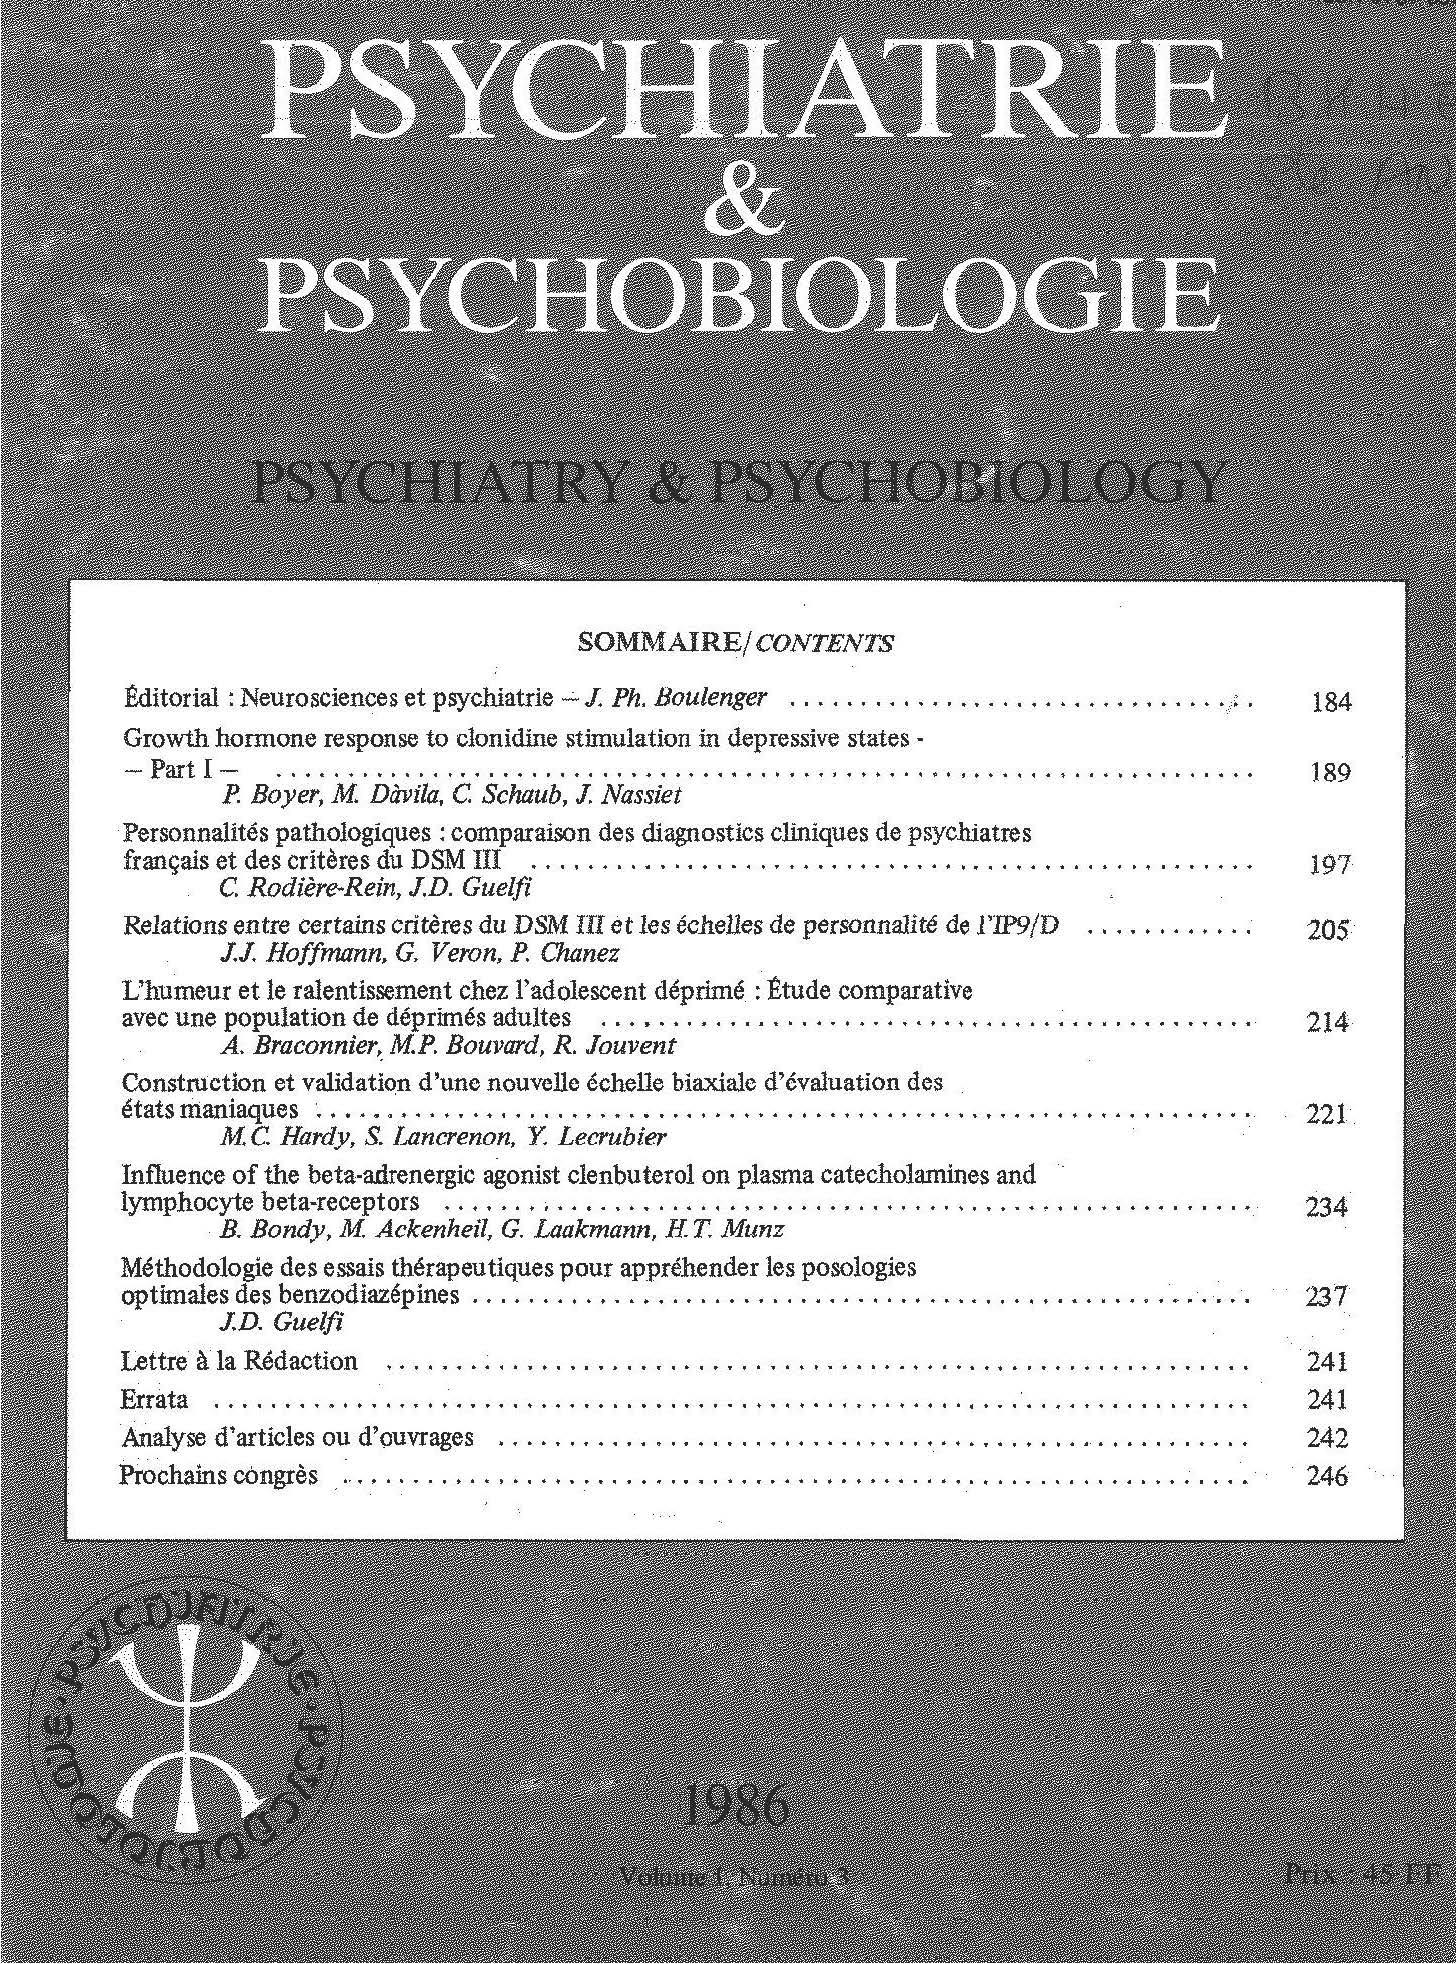 Psychiatry and Psychobiology